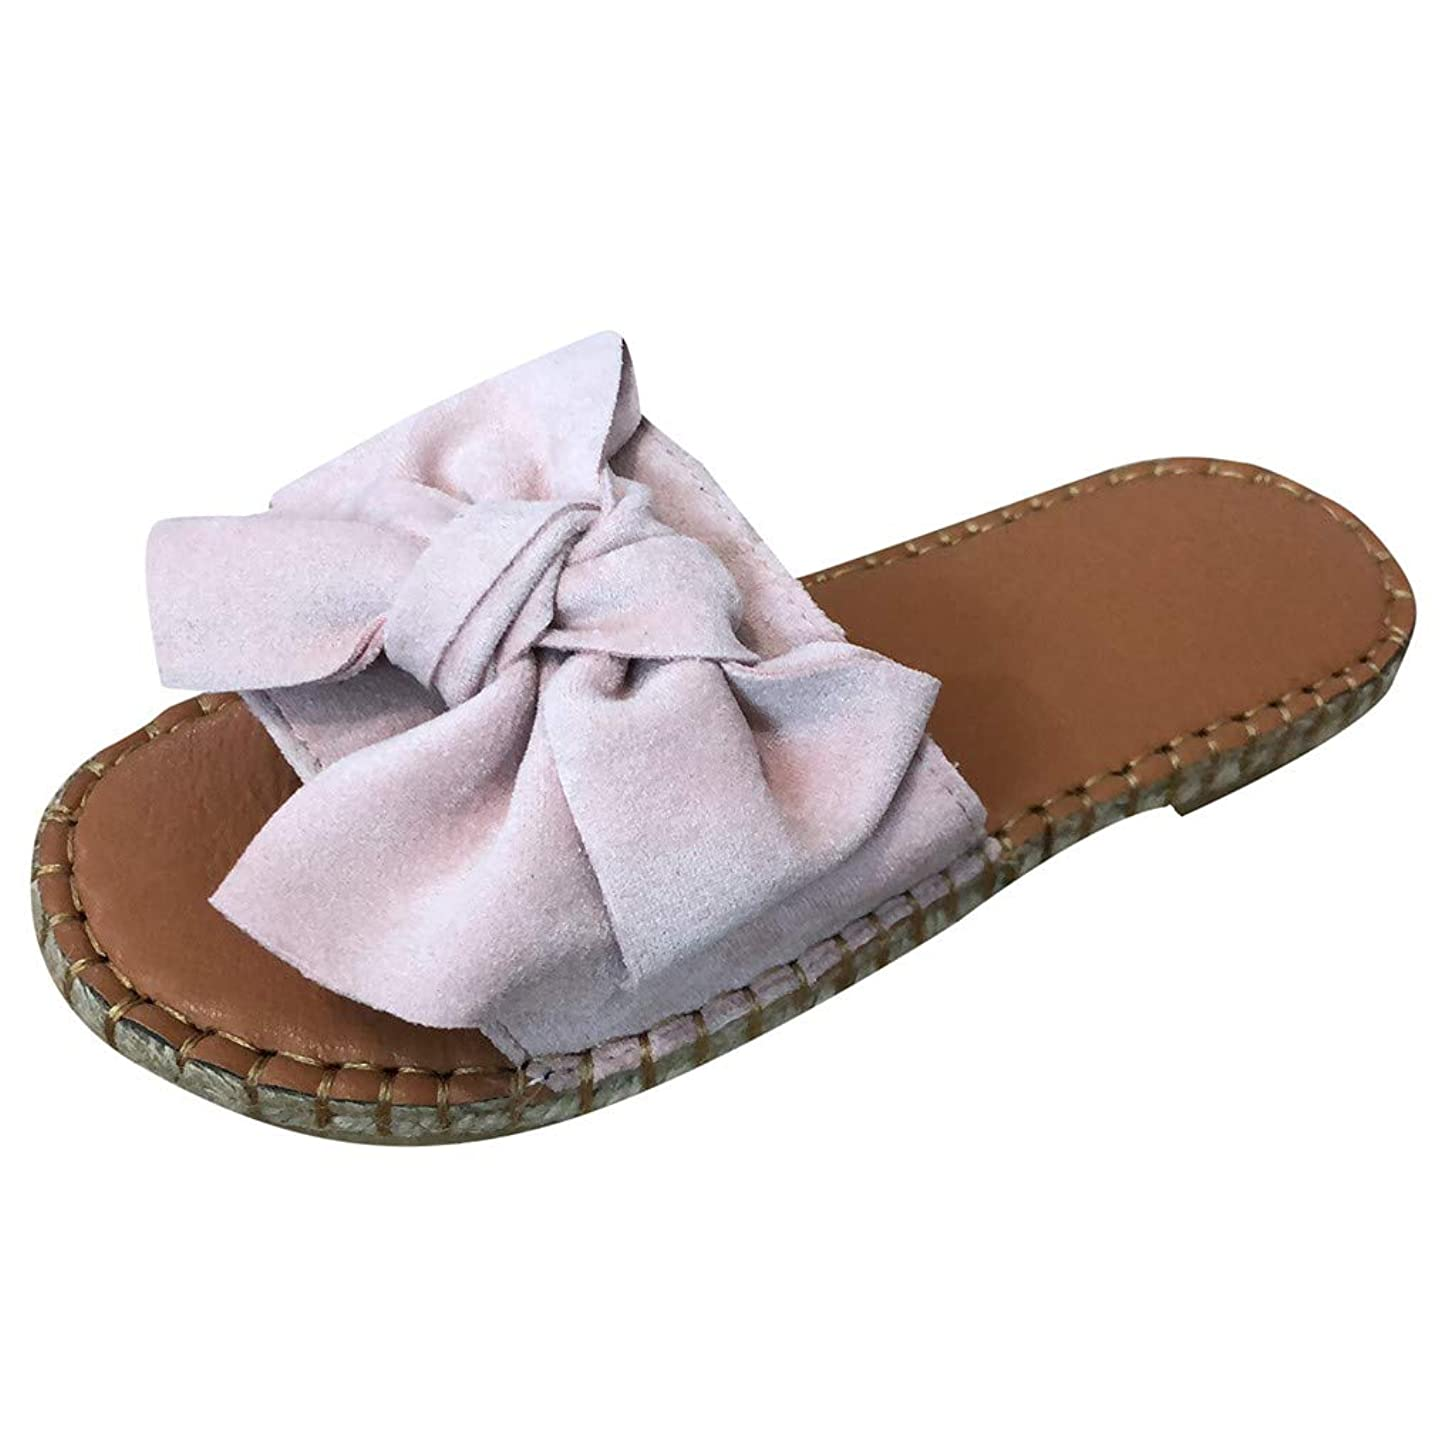 Women Fashion Big Bowknot Espadrilles Flat Sandals Solid Open Toe Casual Beach Walk Slippers Shoes JHKUNO